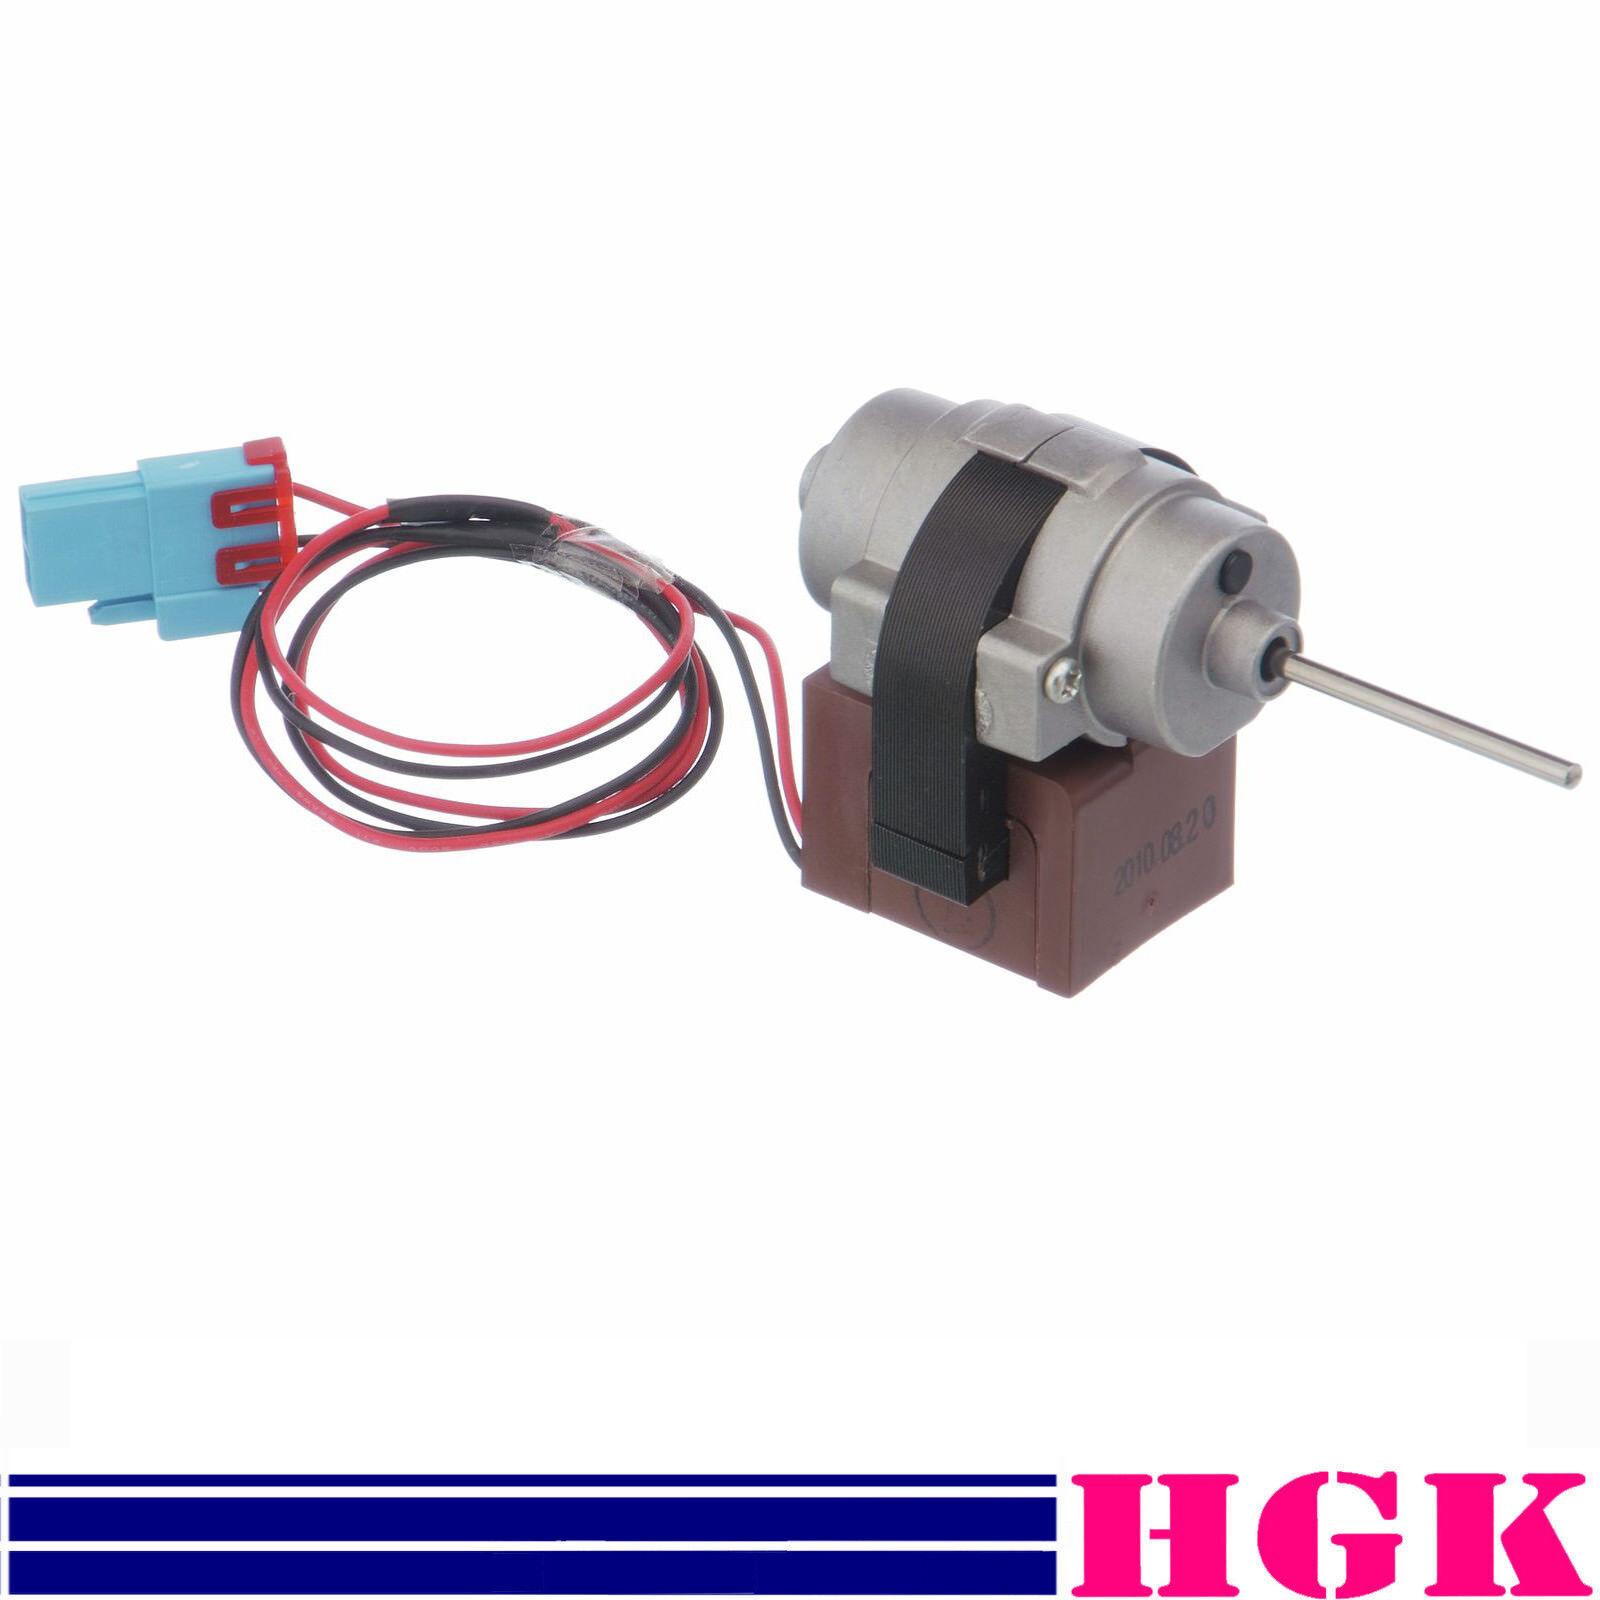 Lüftermotor Ventilator für Siemens Kühlschrank, 00601067, D4612AAA21